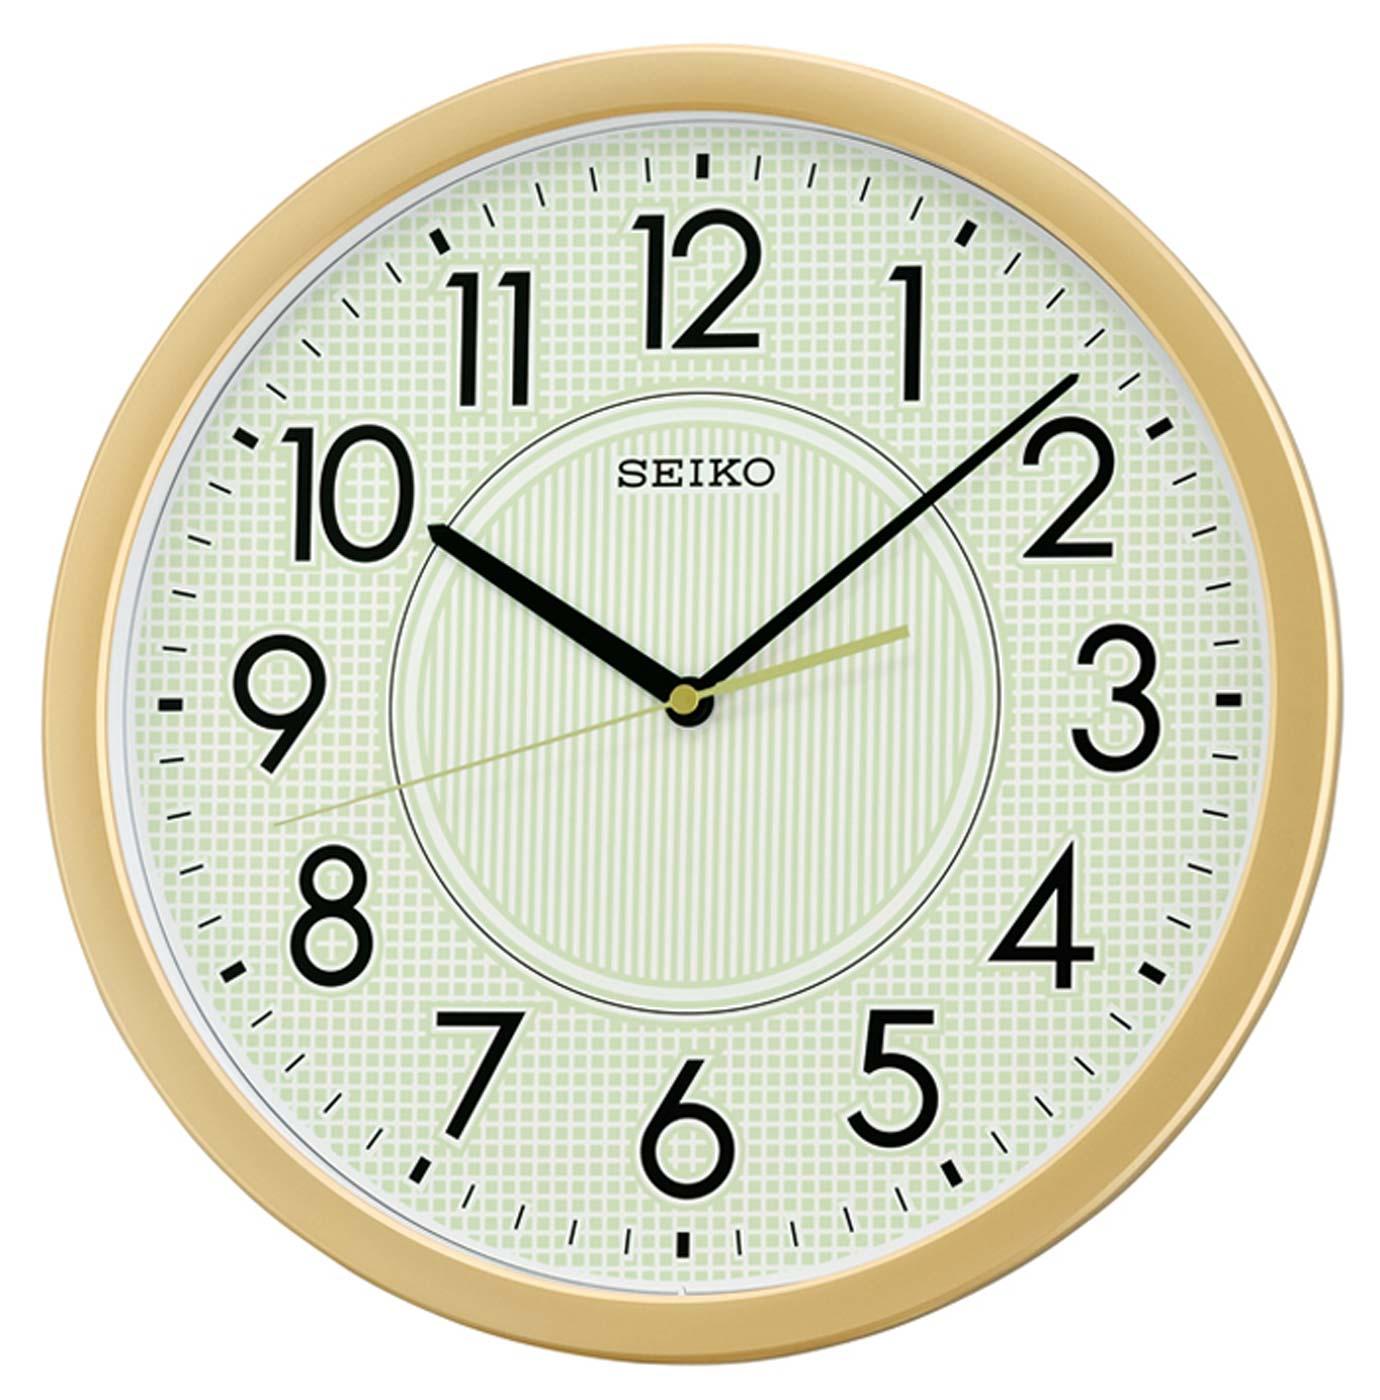 Seiko Qxa629g Wall Clock Quiet Clock Office Clock